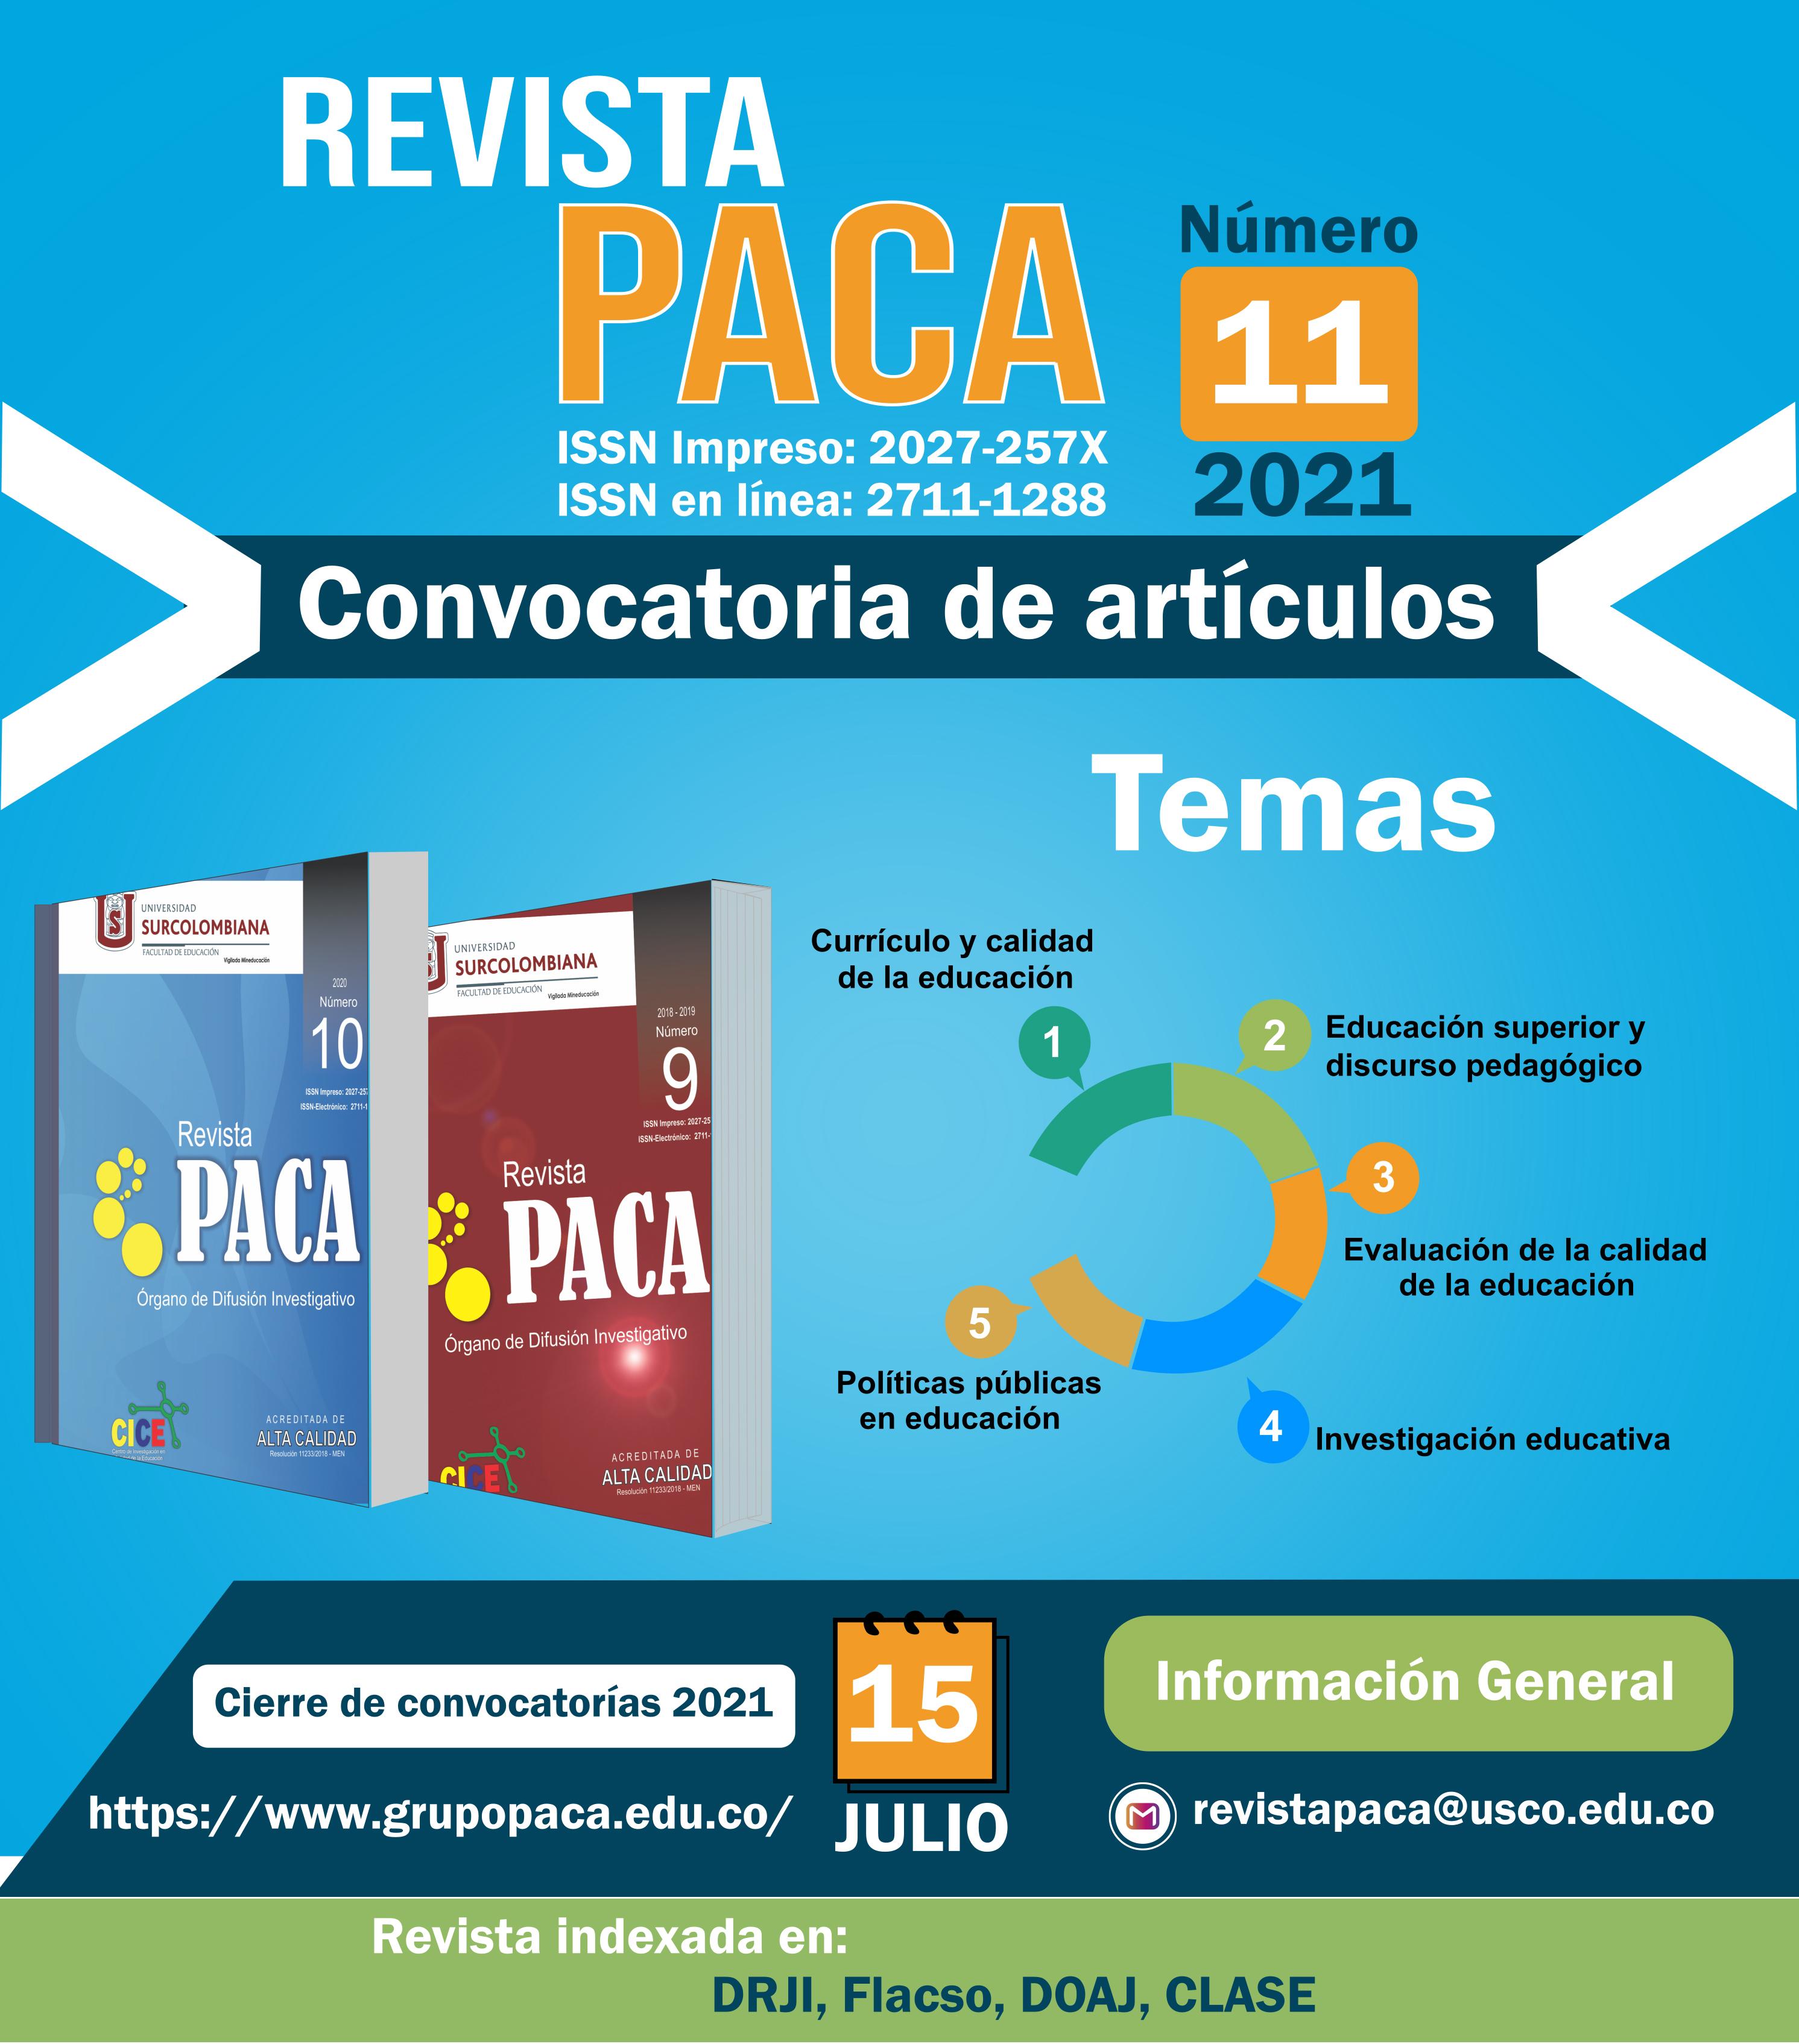 convocatoria-de-articulos-revista-paca-11.jpg